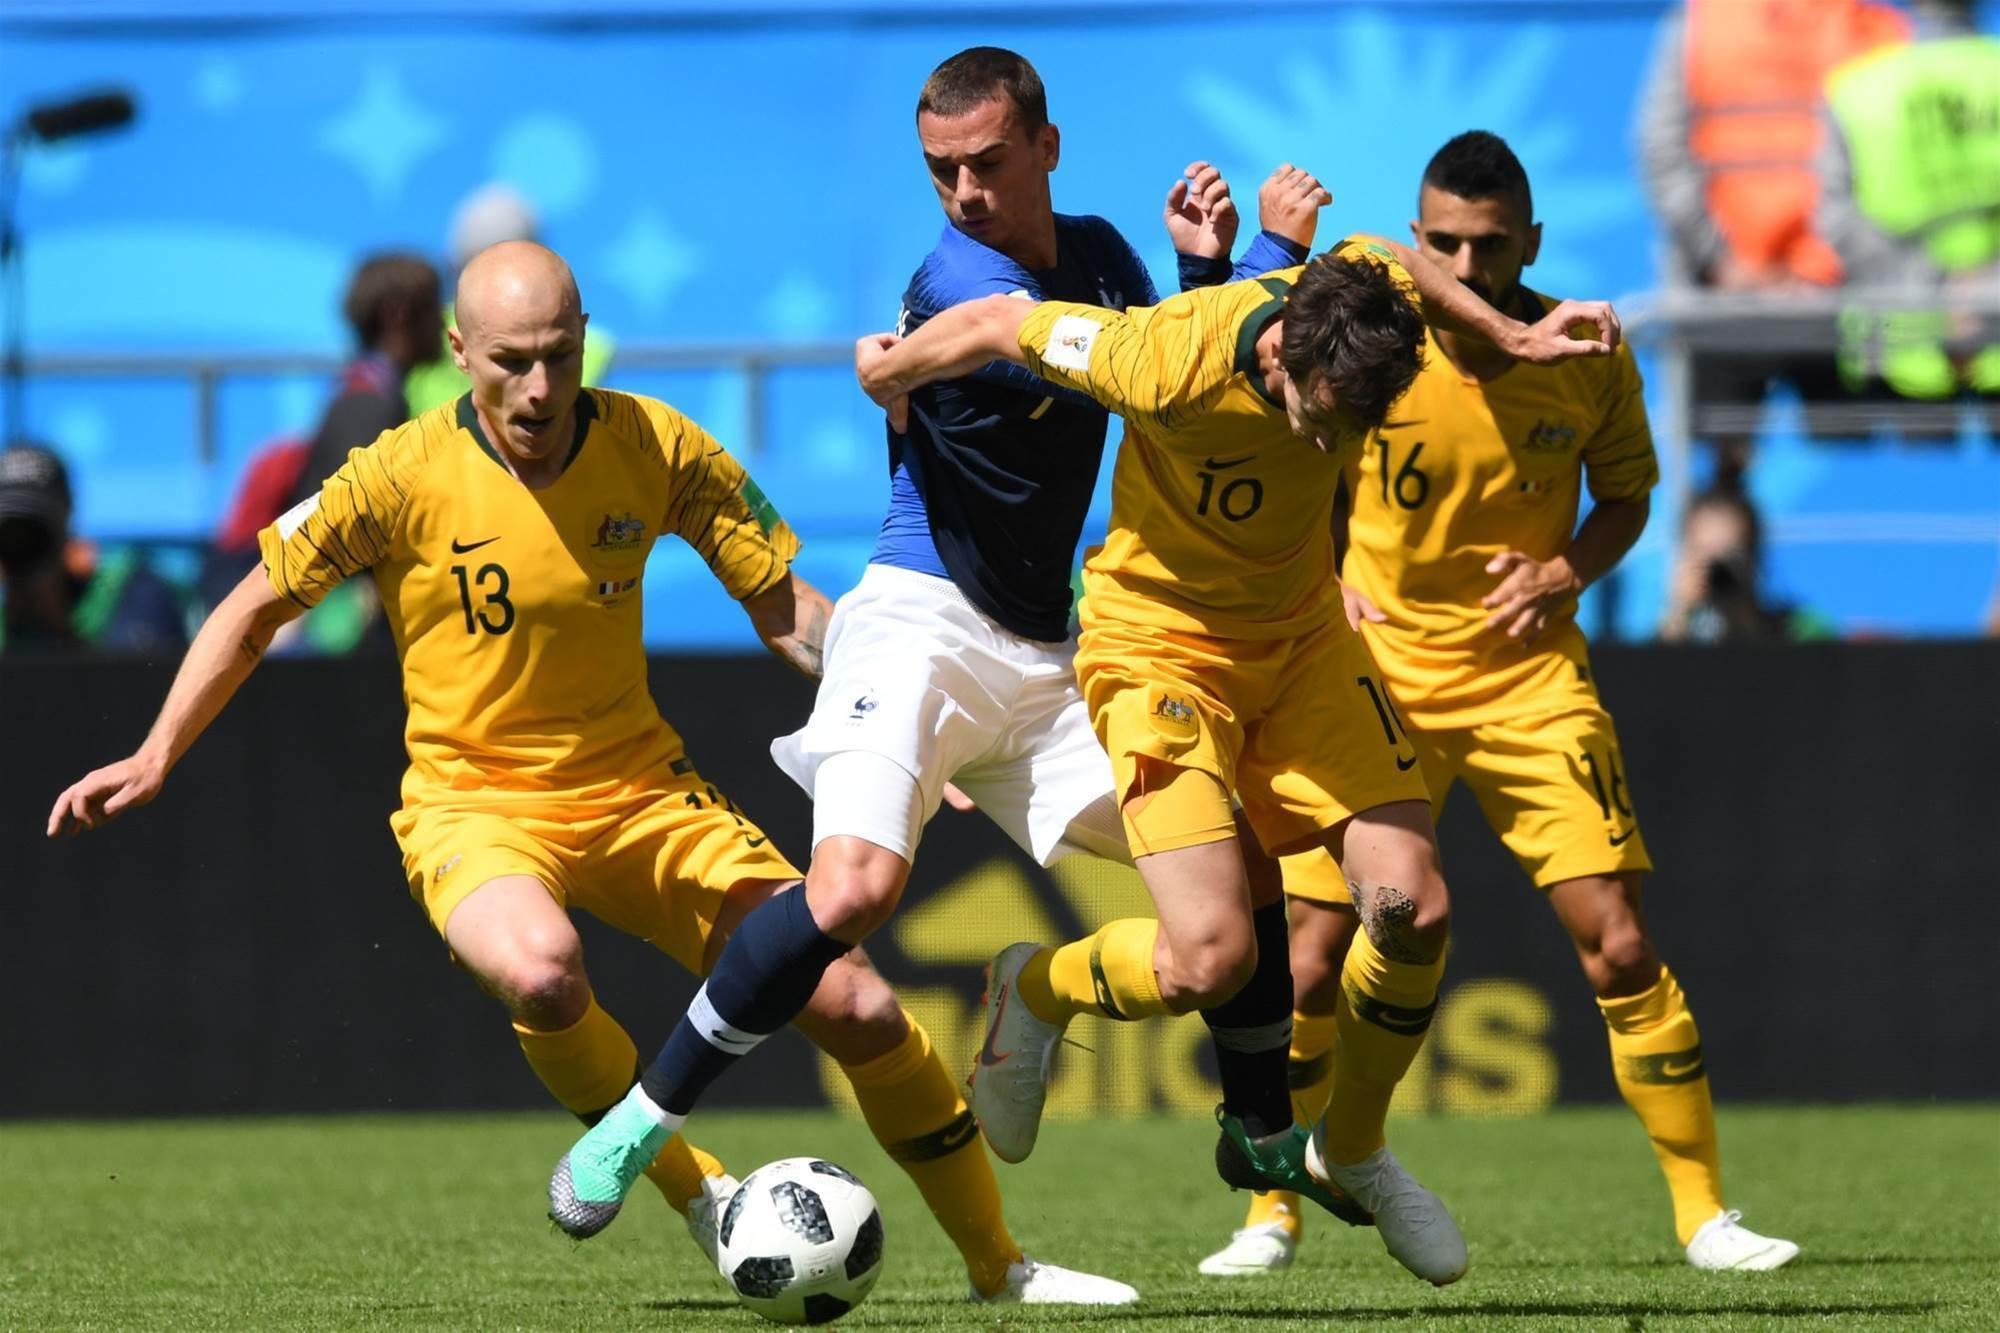 Bumper France v Socceroos pic special